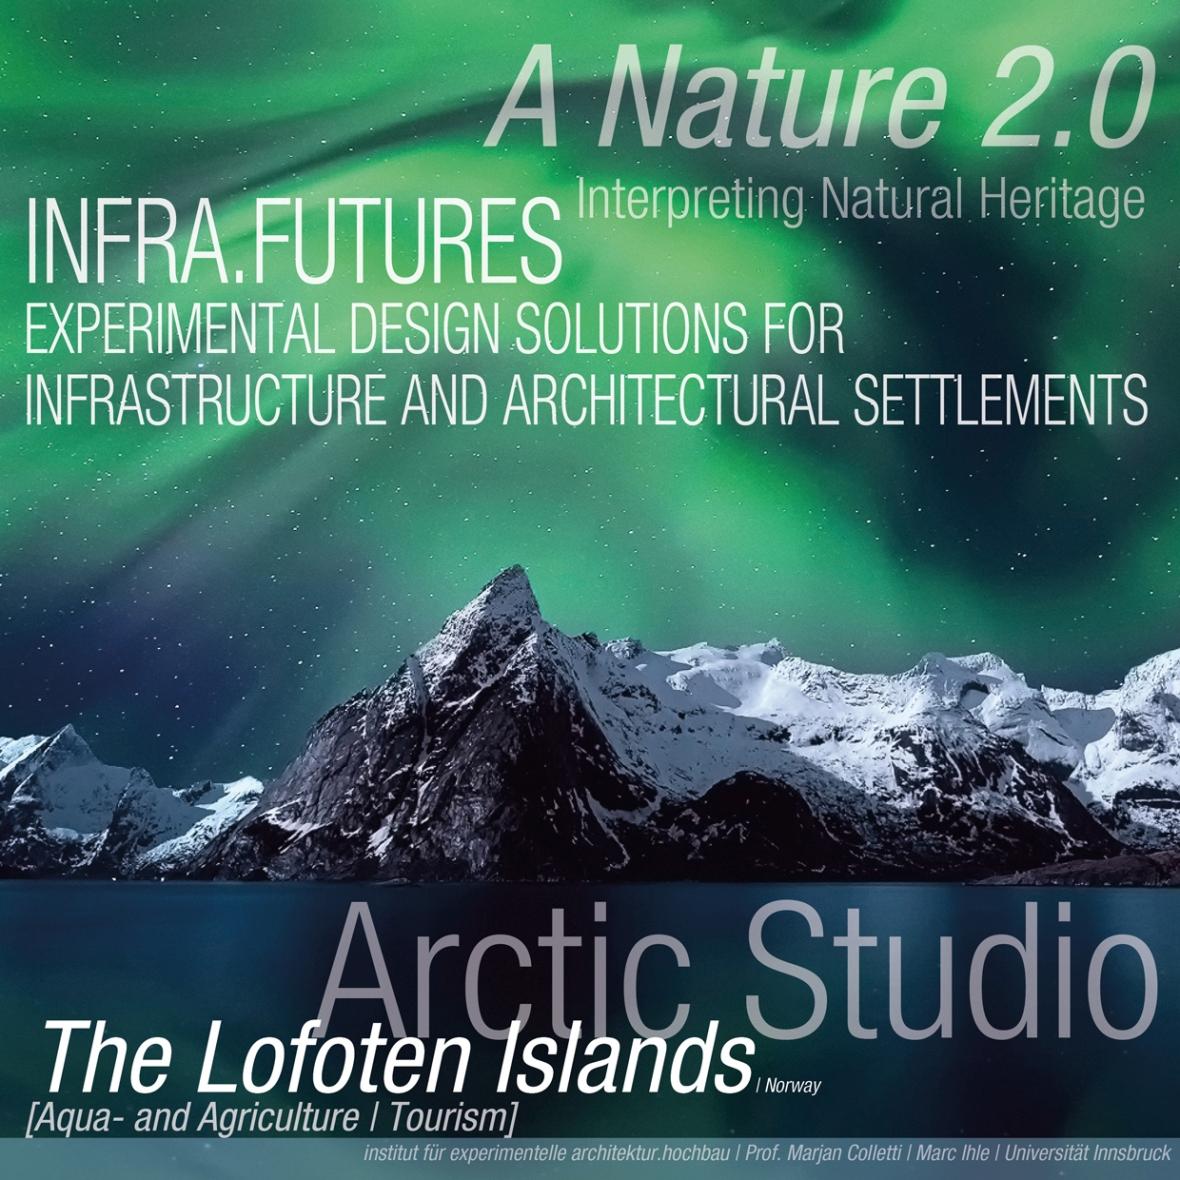 marc-ihle-arctic-studio-uibk-poster-bachelor-2017-10-23-001_sq1240px